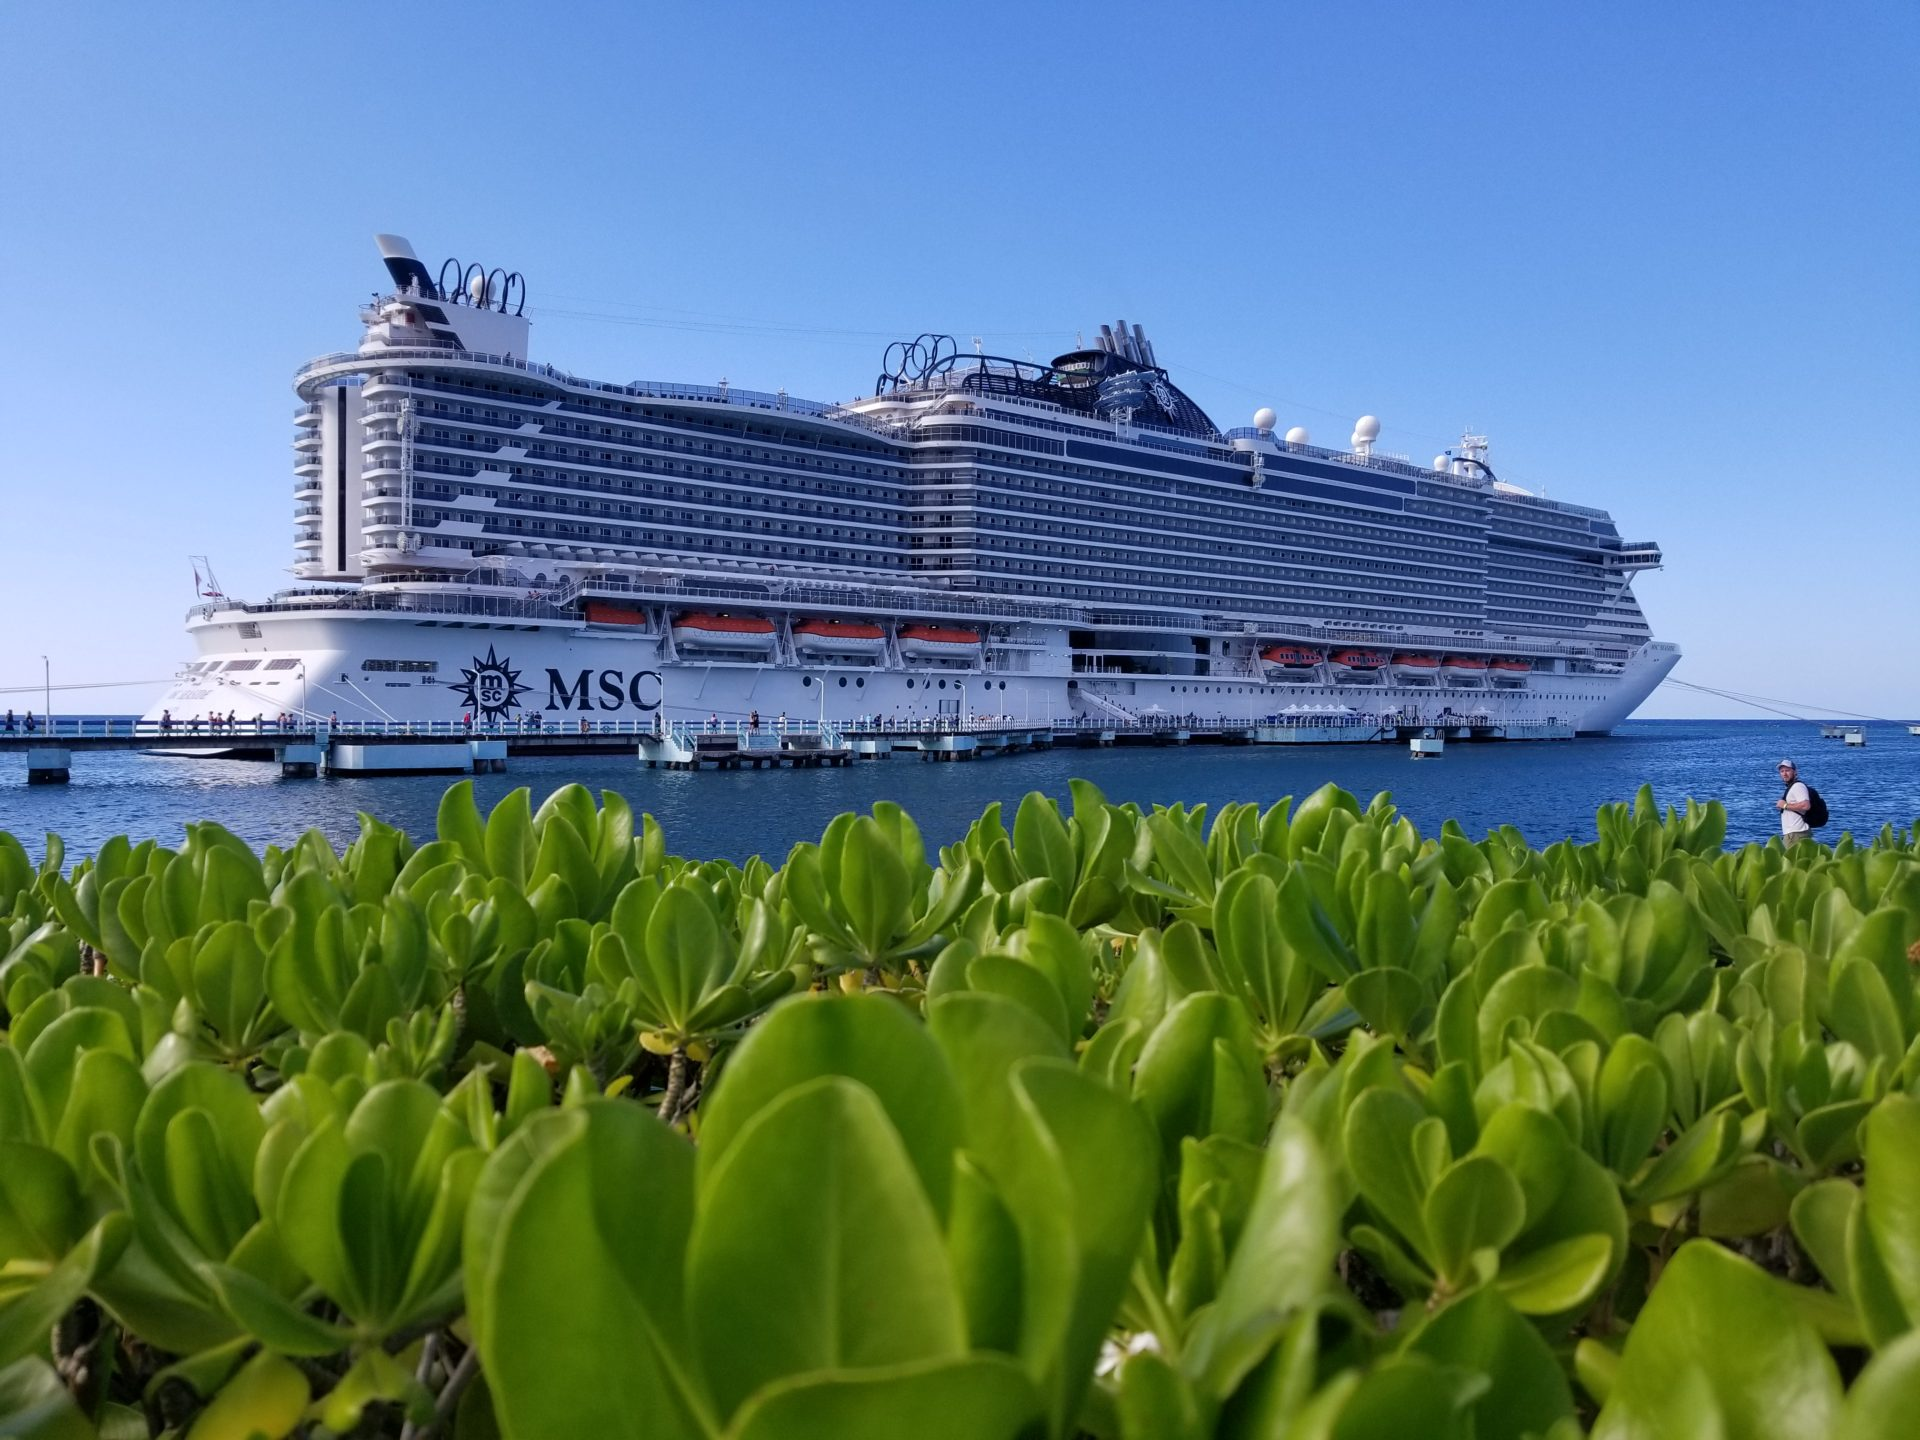 Photo of the MSC Seaside